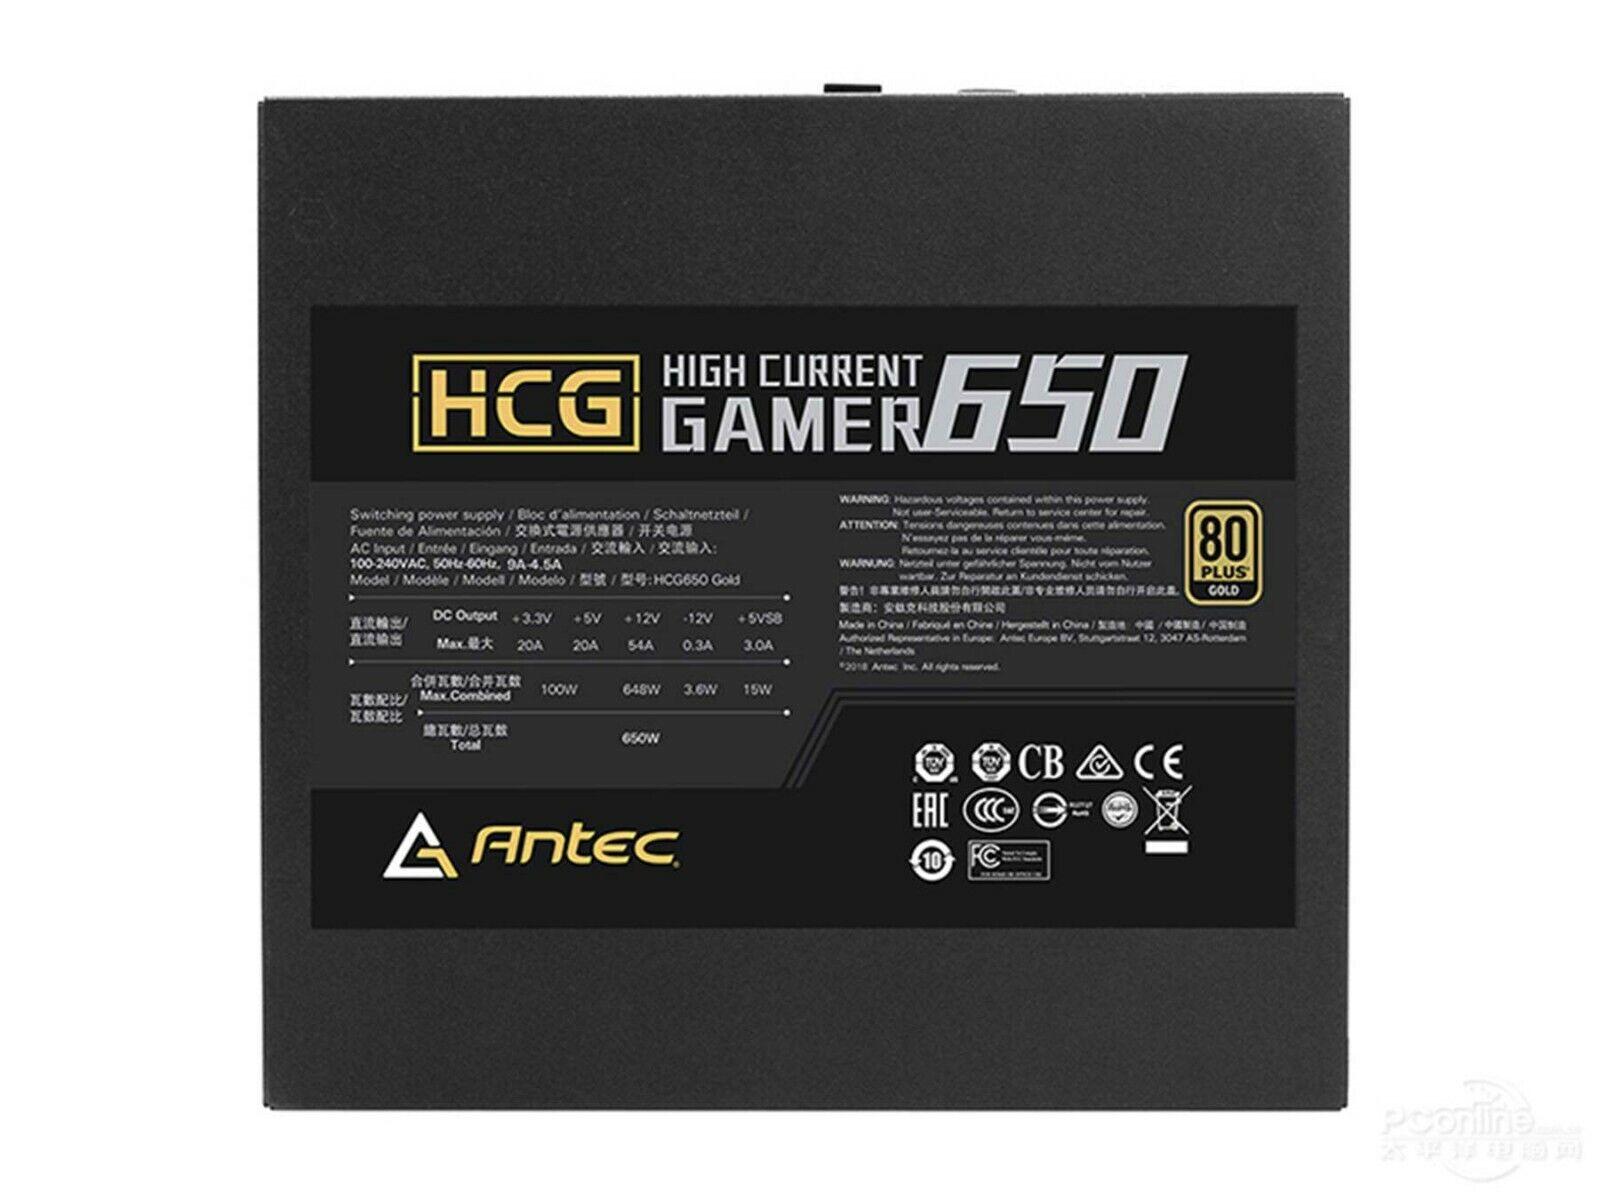 6+2pin PCI-E VGA Power Supply Cable for Antec HCG650 Gold and GPU 50cm